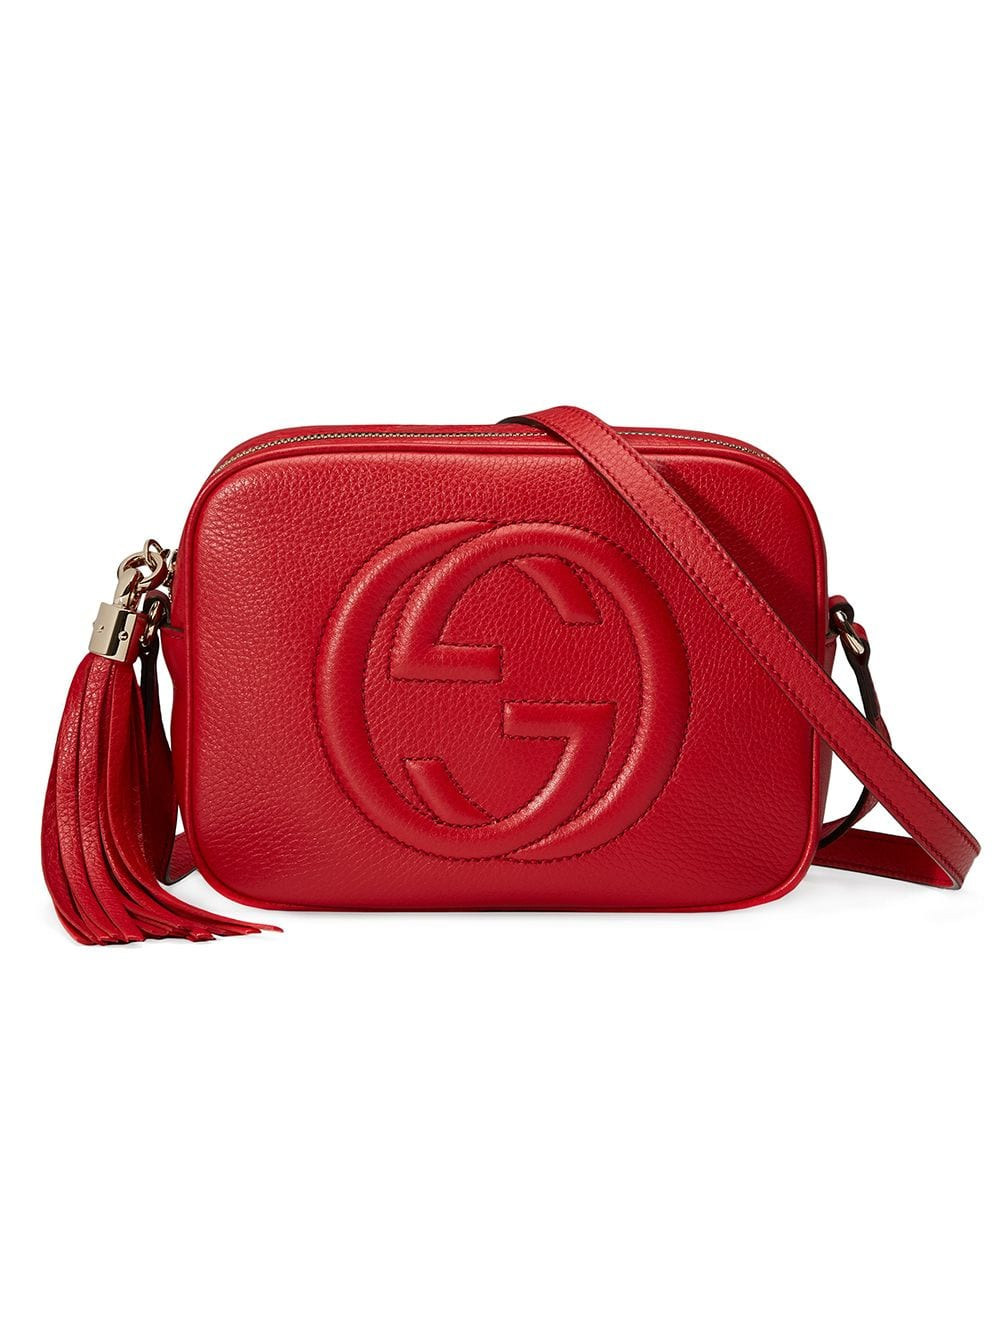 Soho Small Leather Shoulder Bag